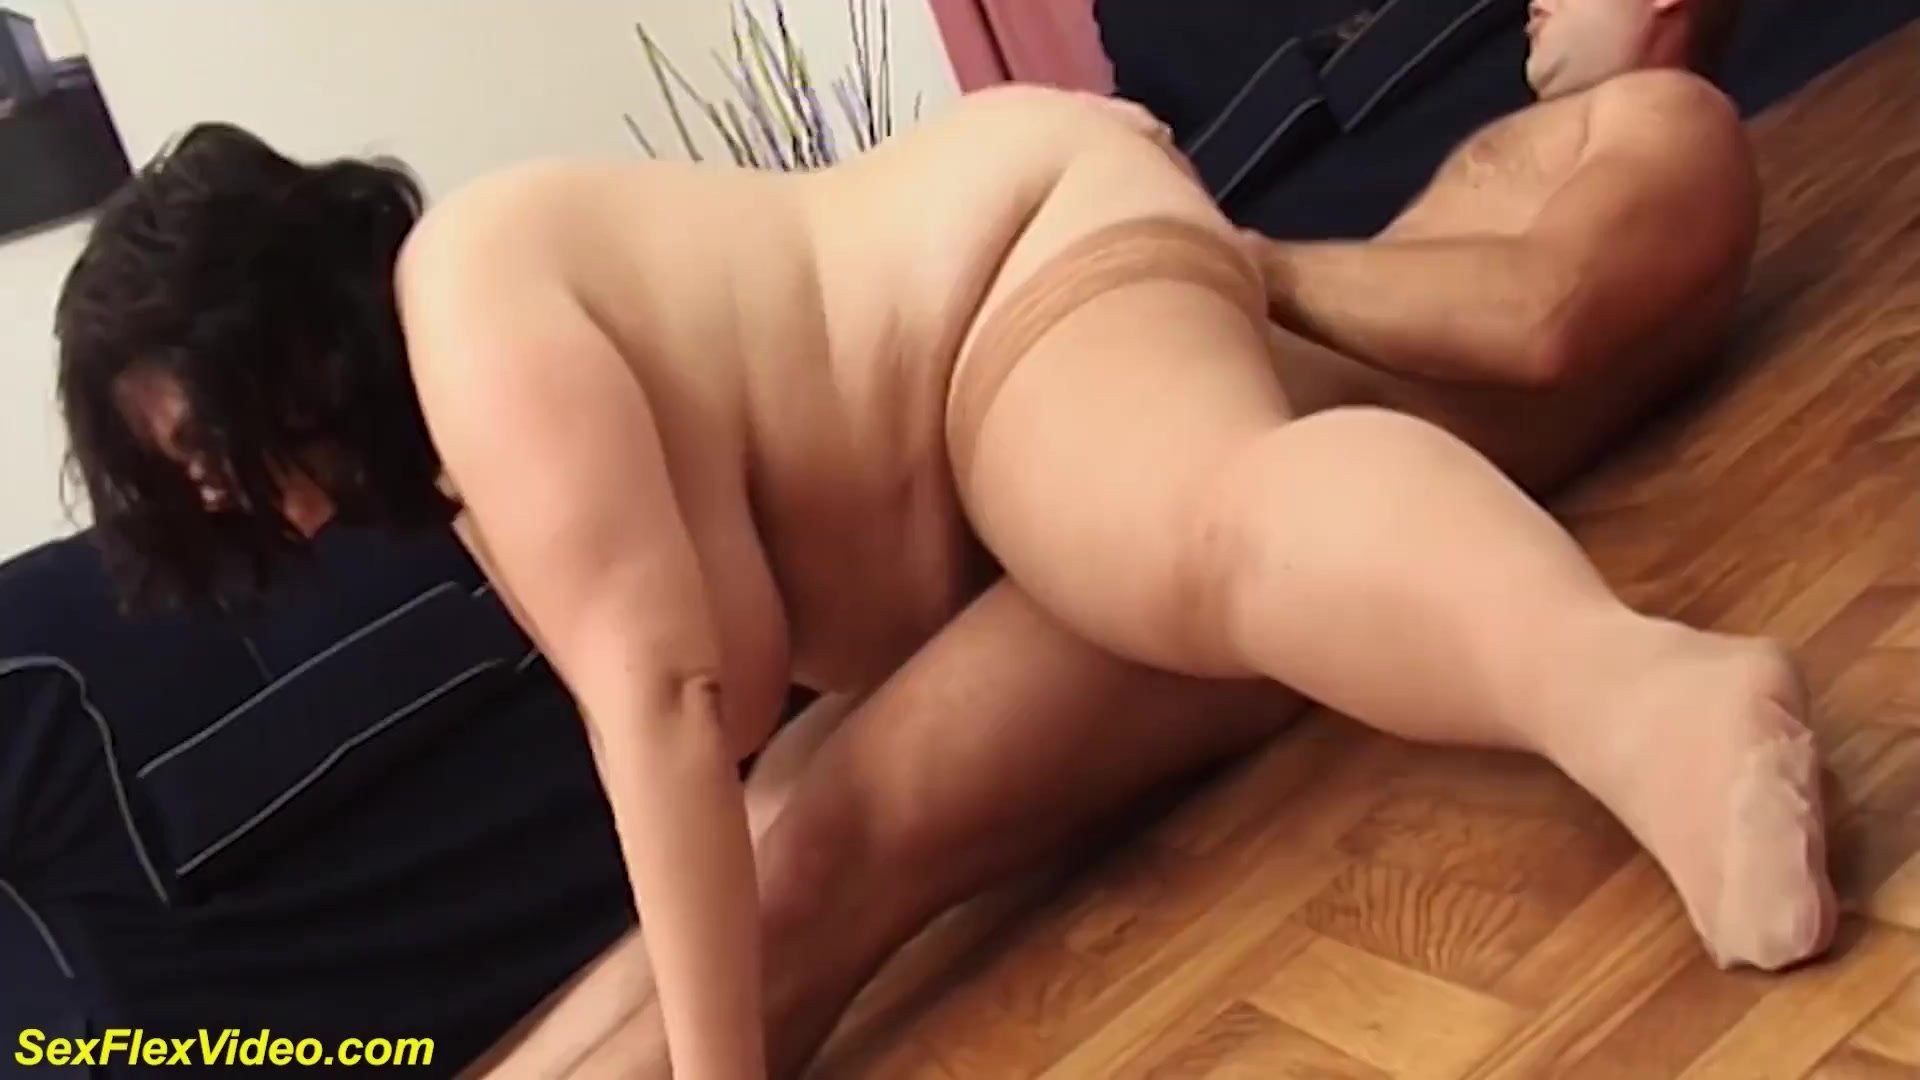 flexi sex with my bbw stepsister